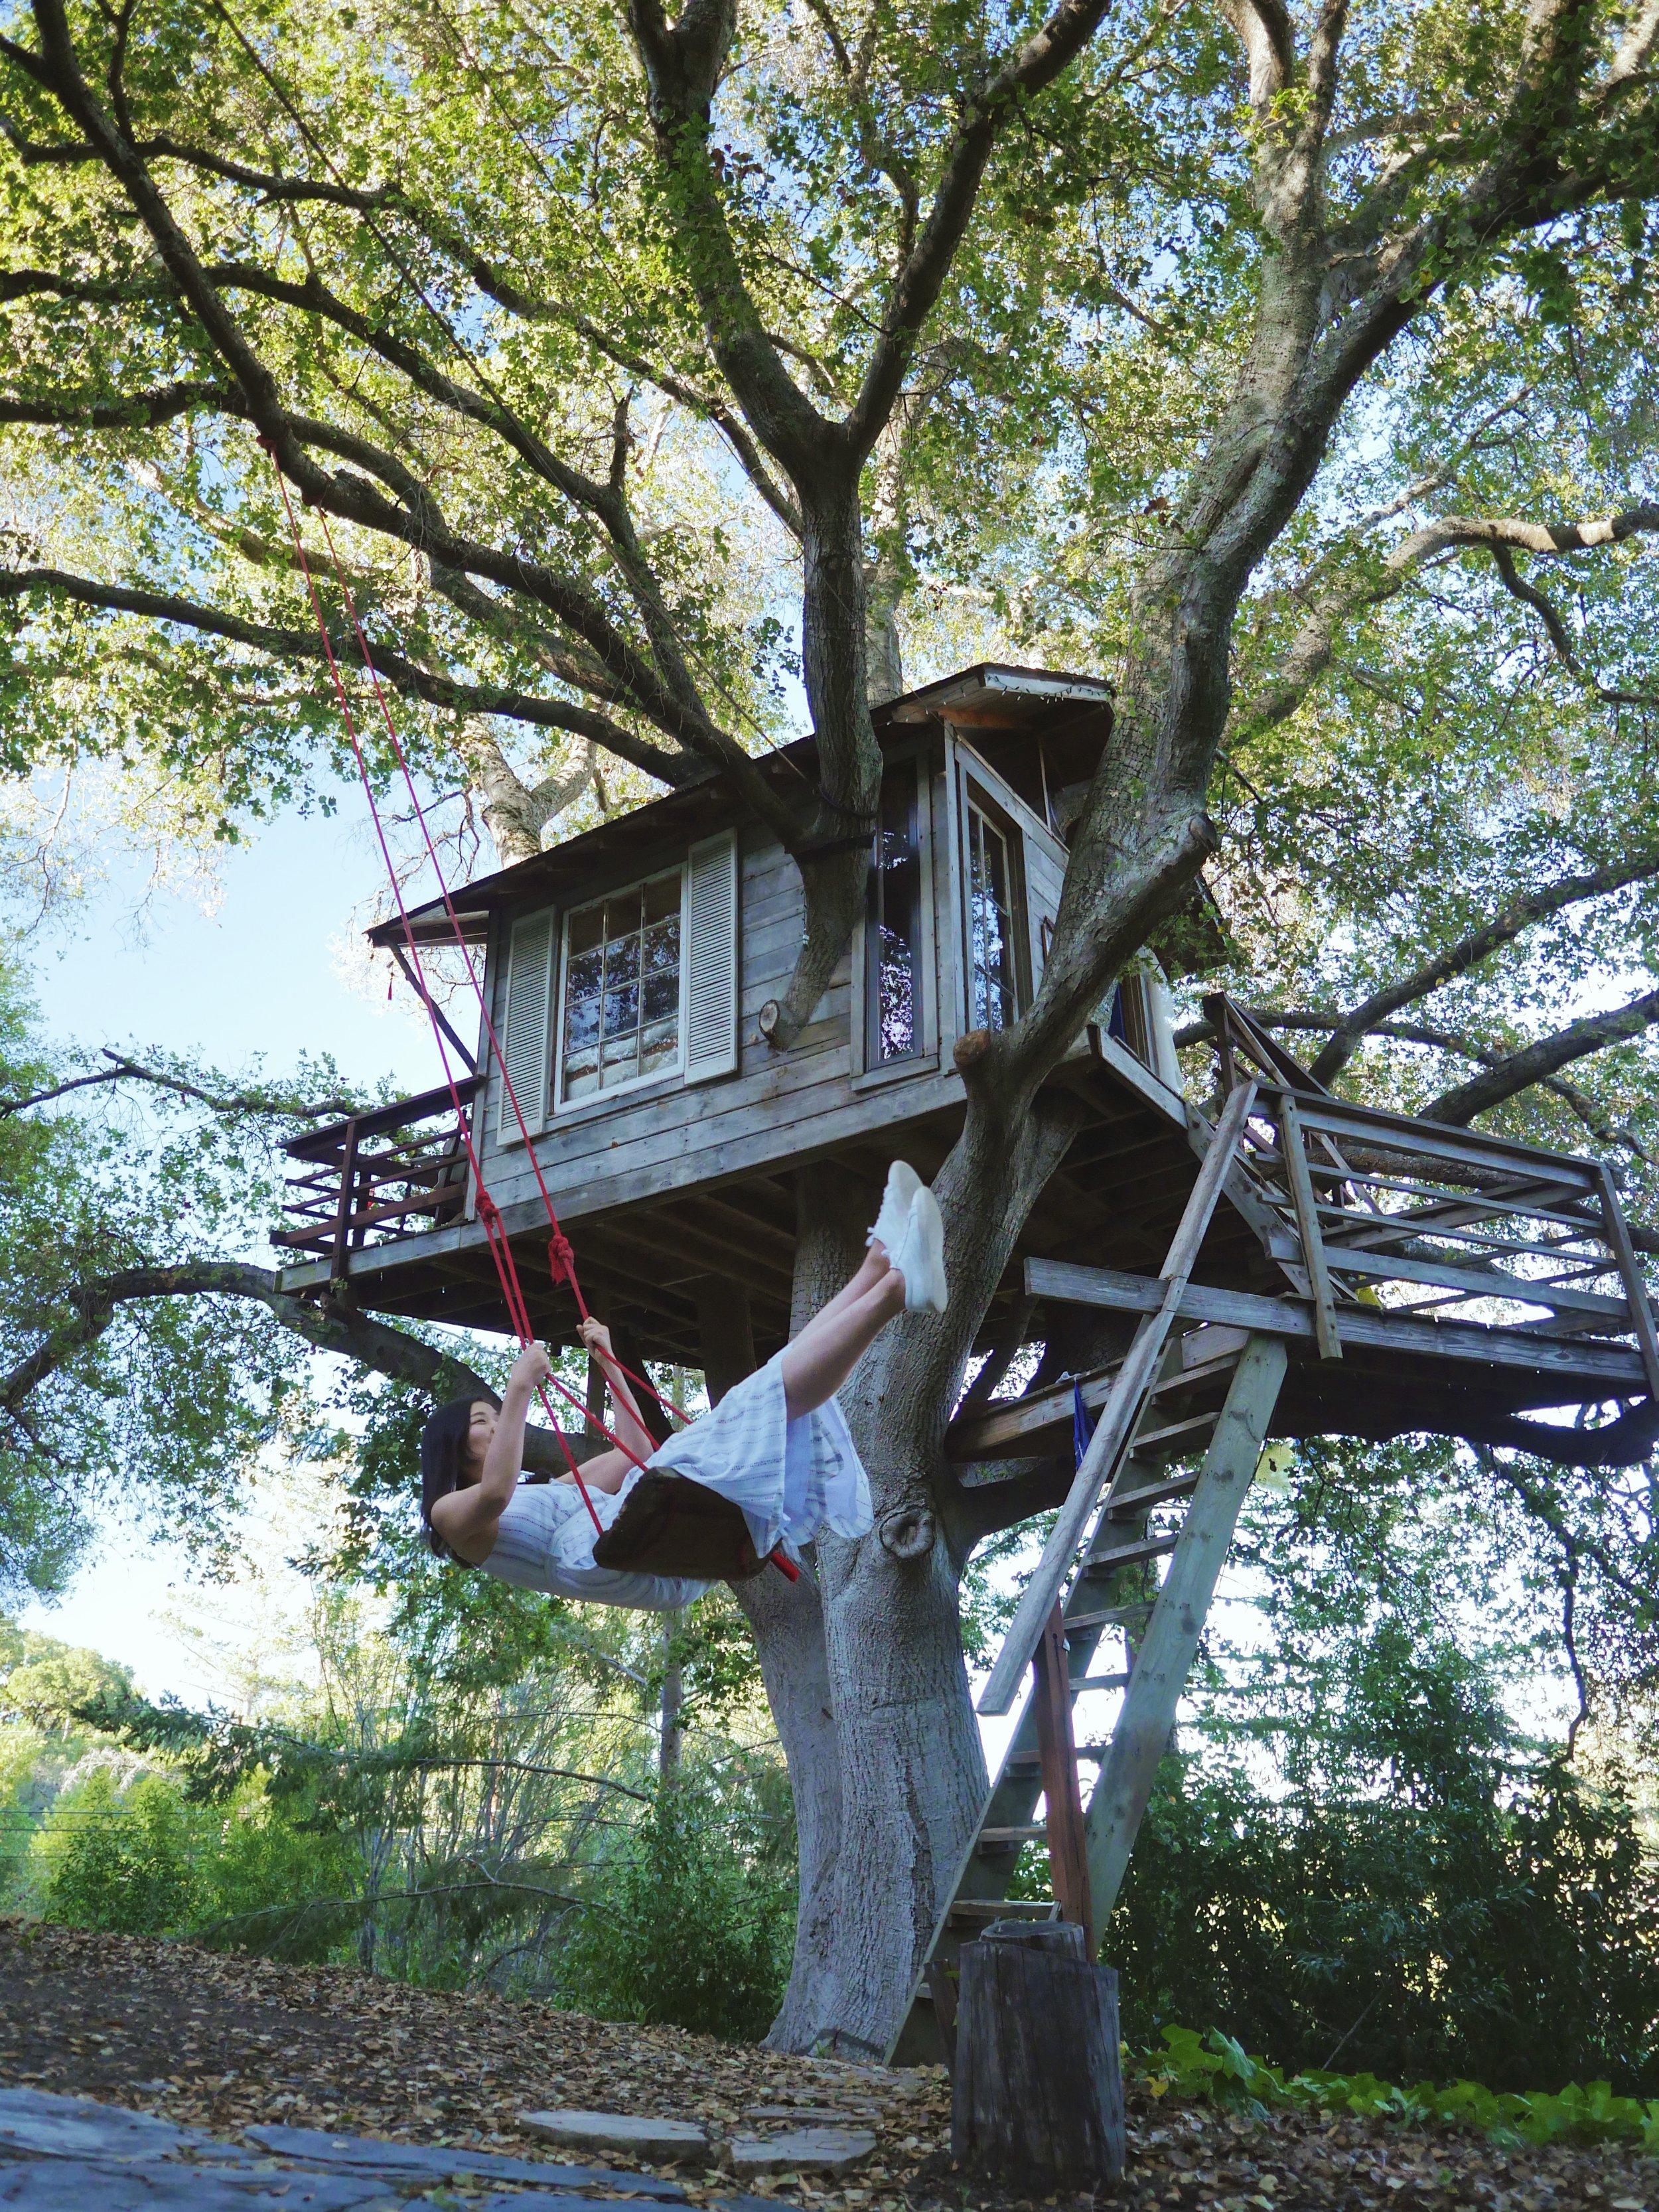 @ Doug's Tree House, Burlingame, California